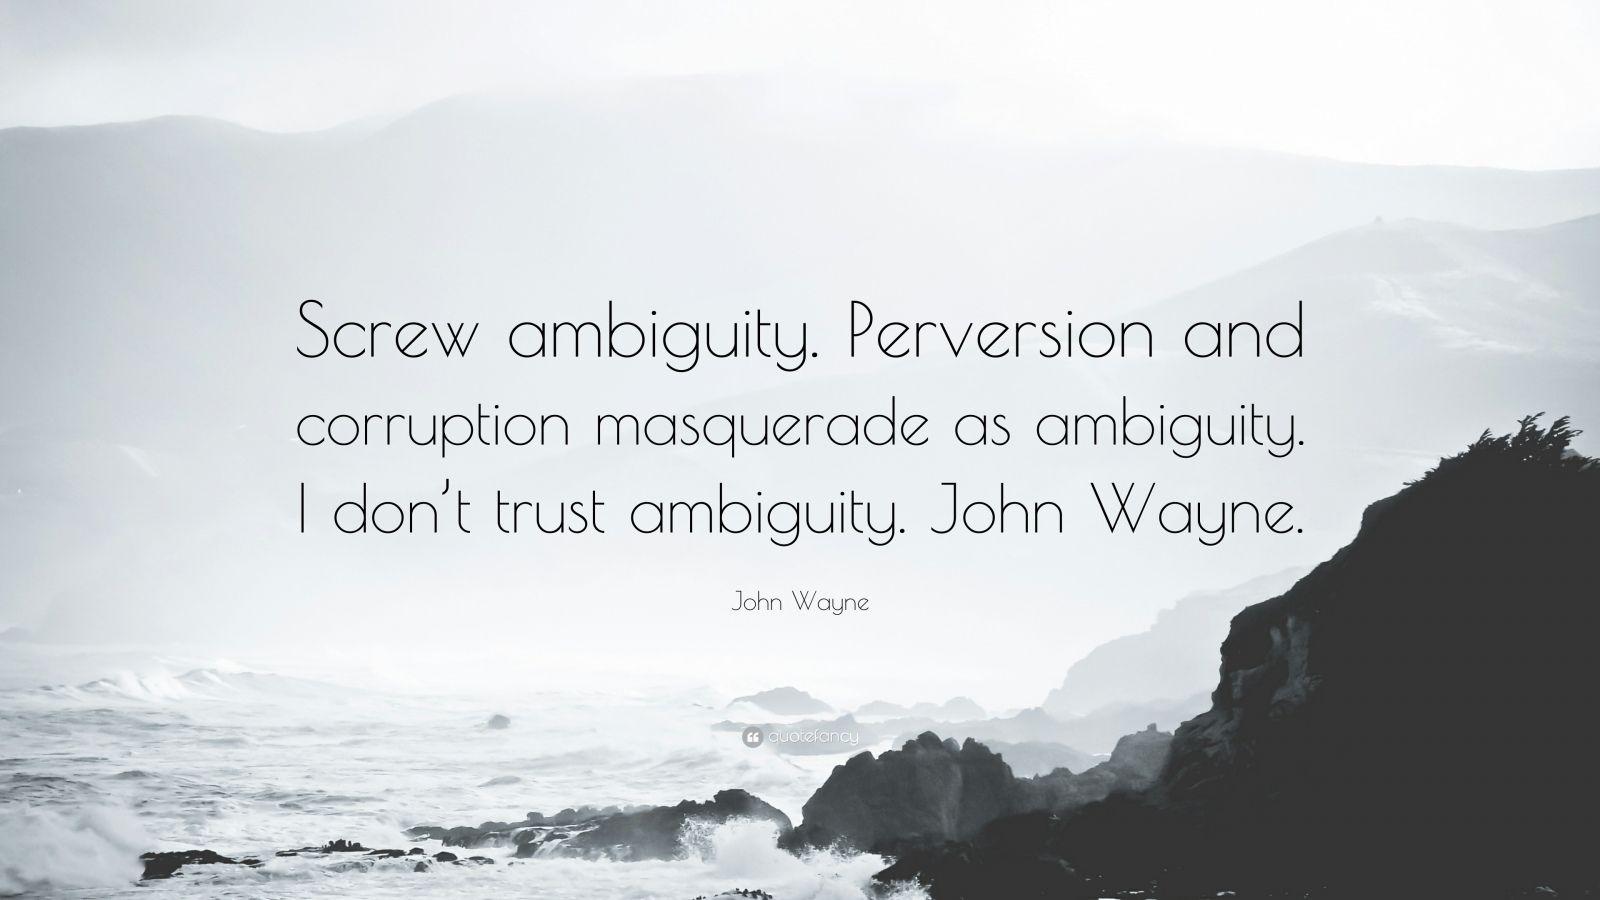 "John Wayne Quote: ""Screw ambiguity. Perversion and corruption masquerade as ambiguity. I don't trust ambiguity. John Wayne."""